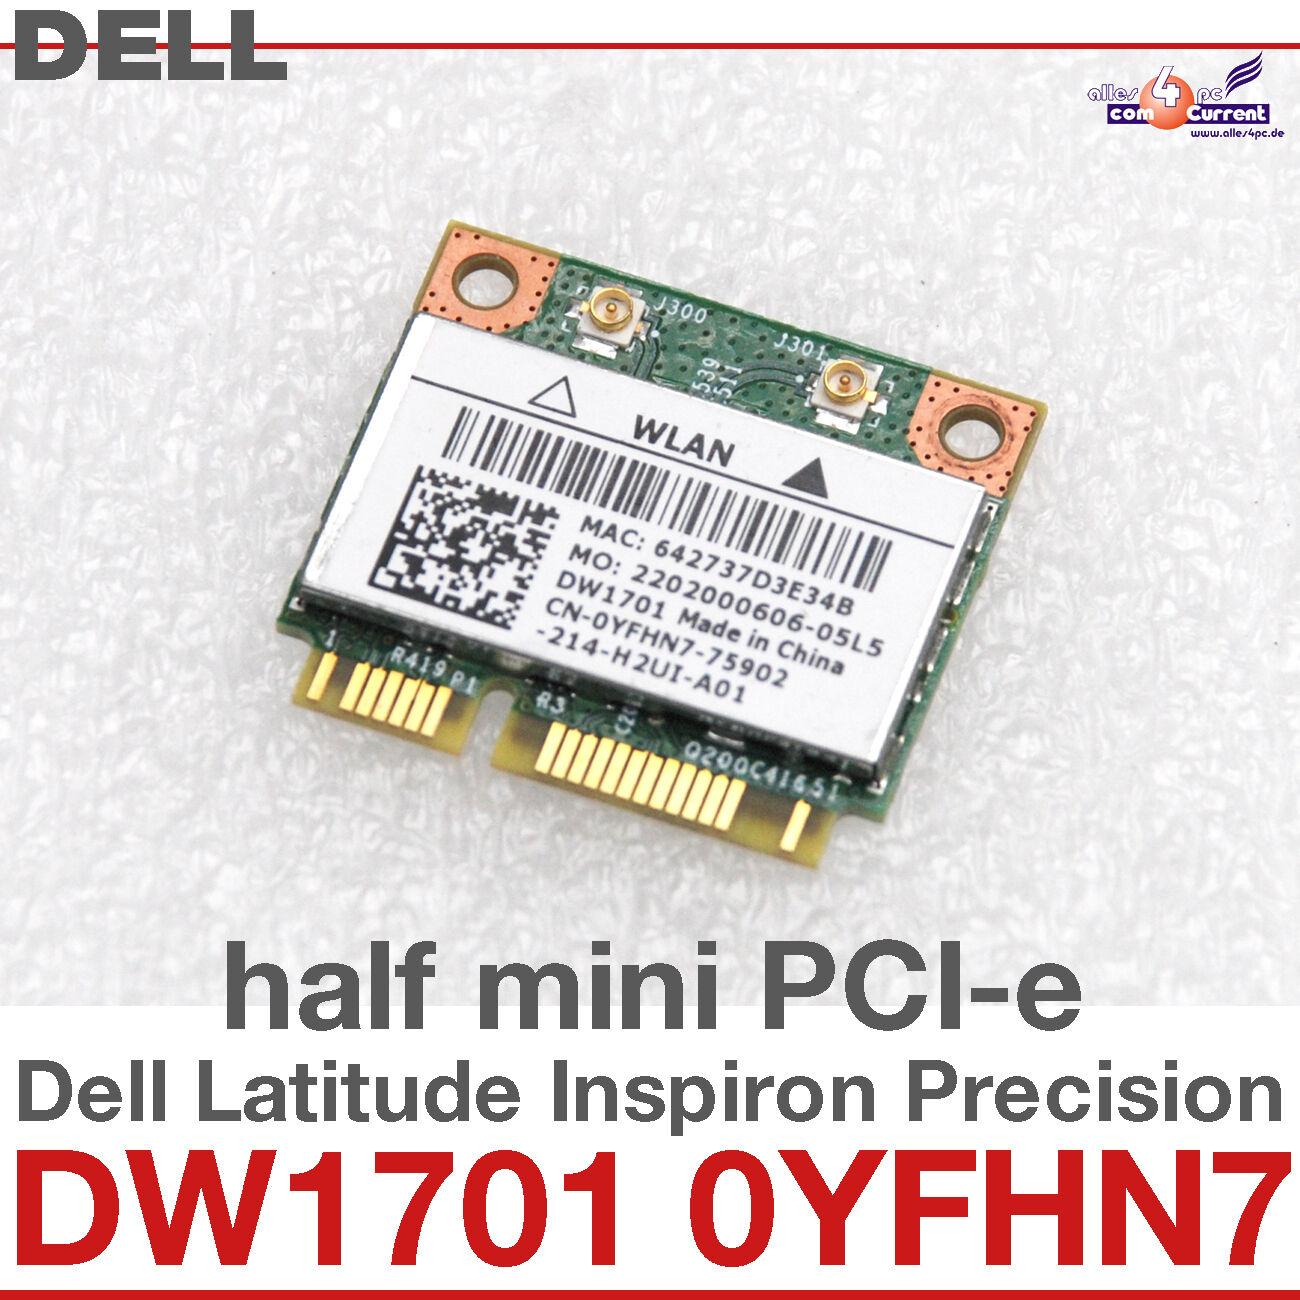 wi-Fi WLAN Wireless Card Network Card For Dell Mini Pci-E DW1701 0YFHN7 #D11